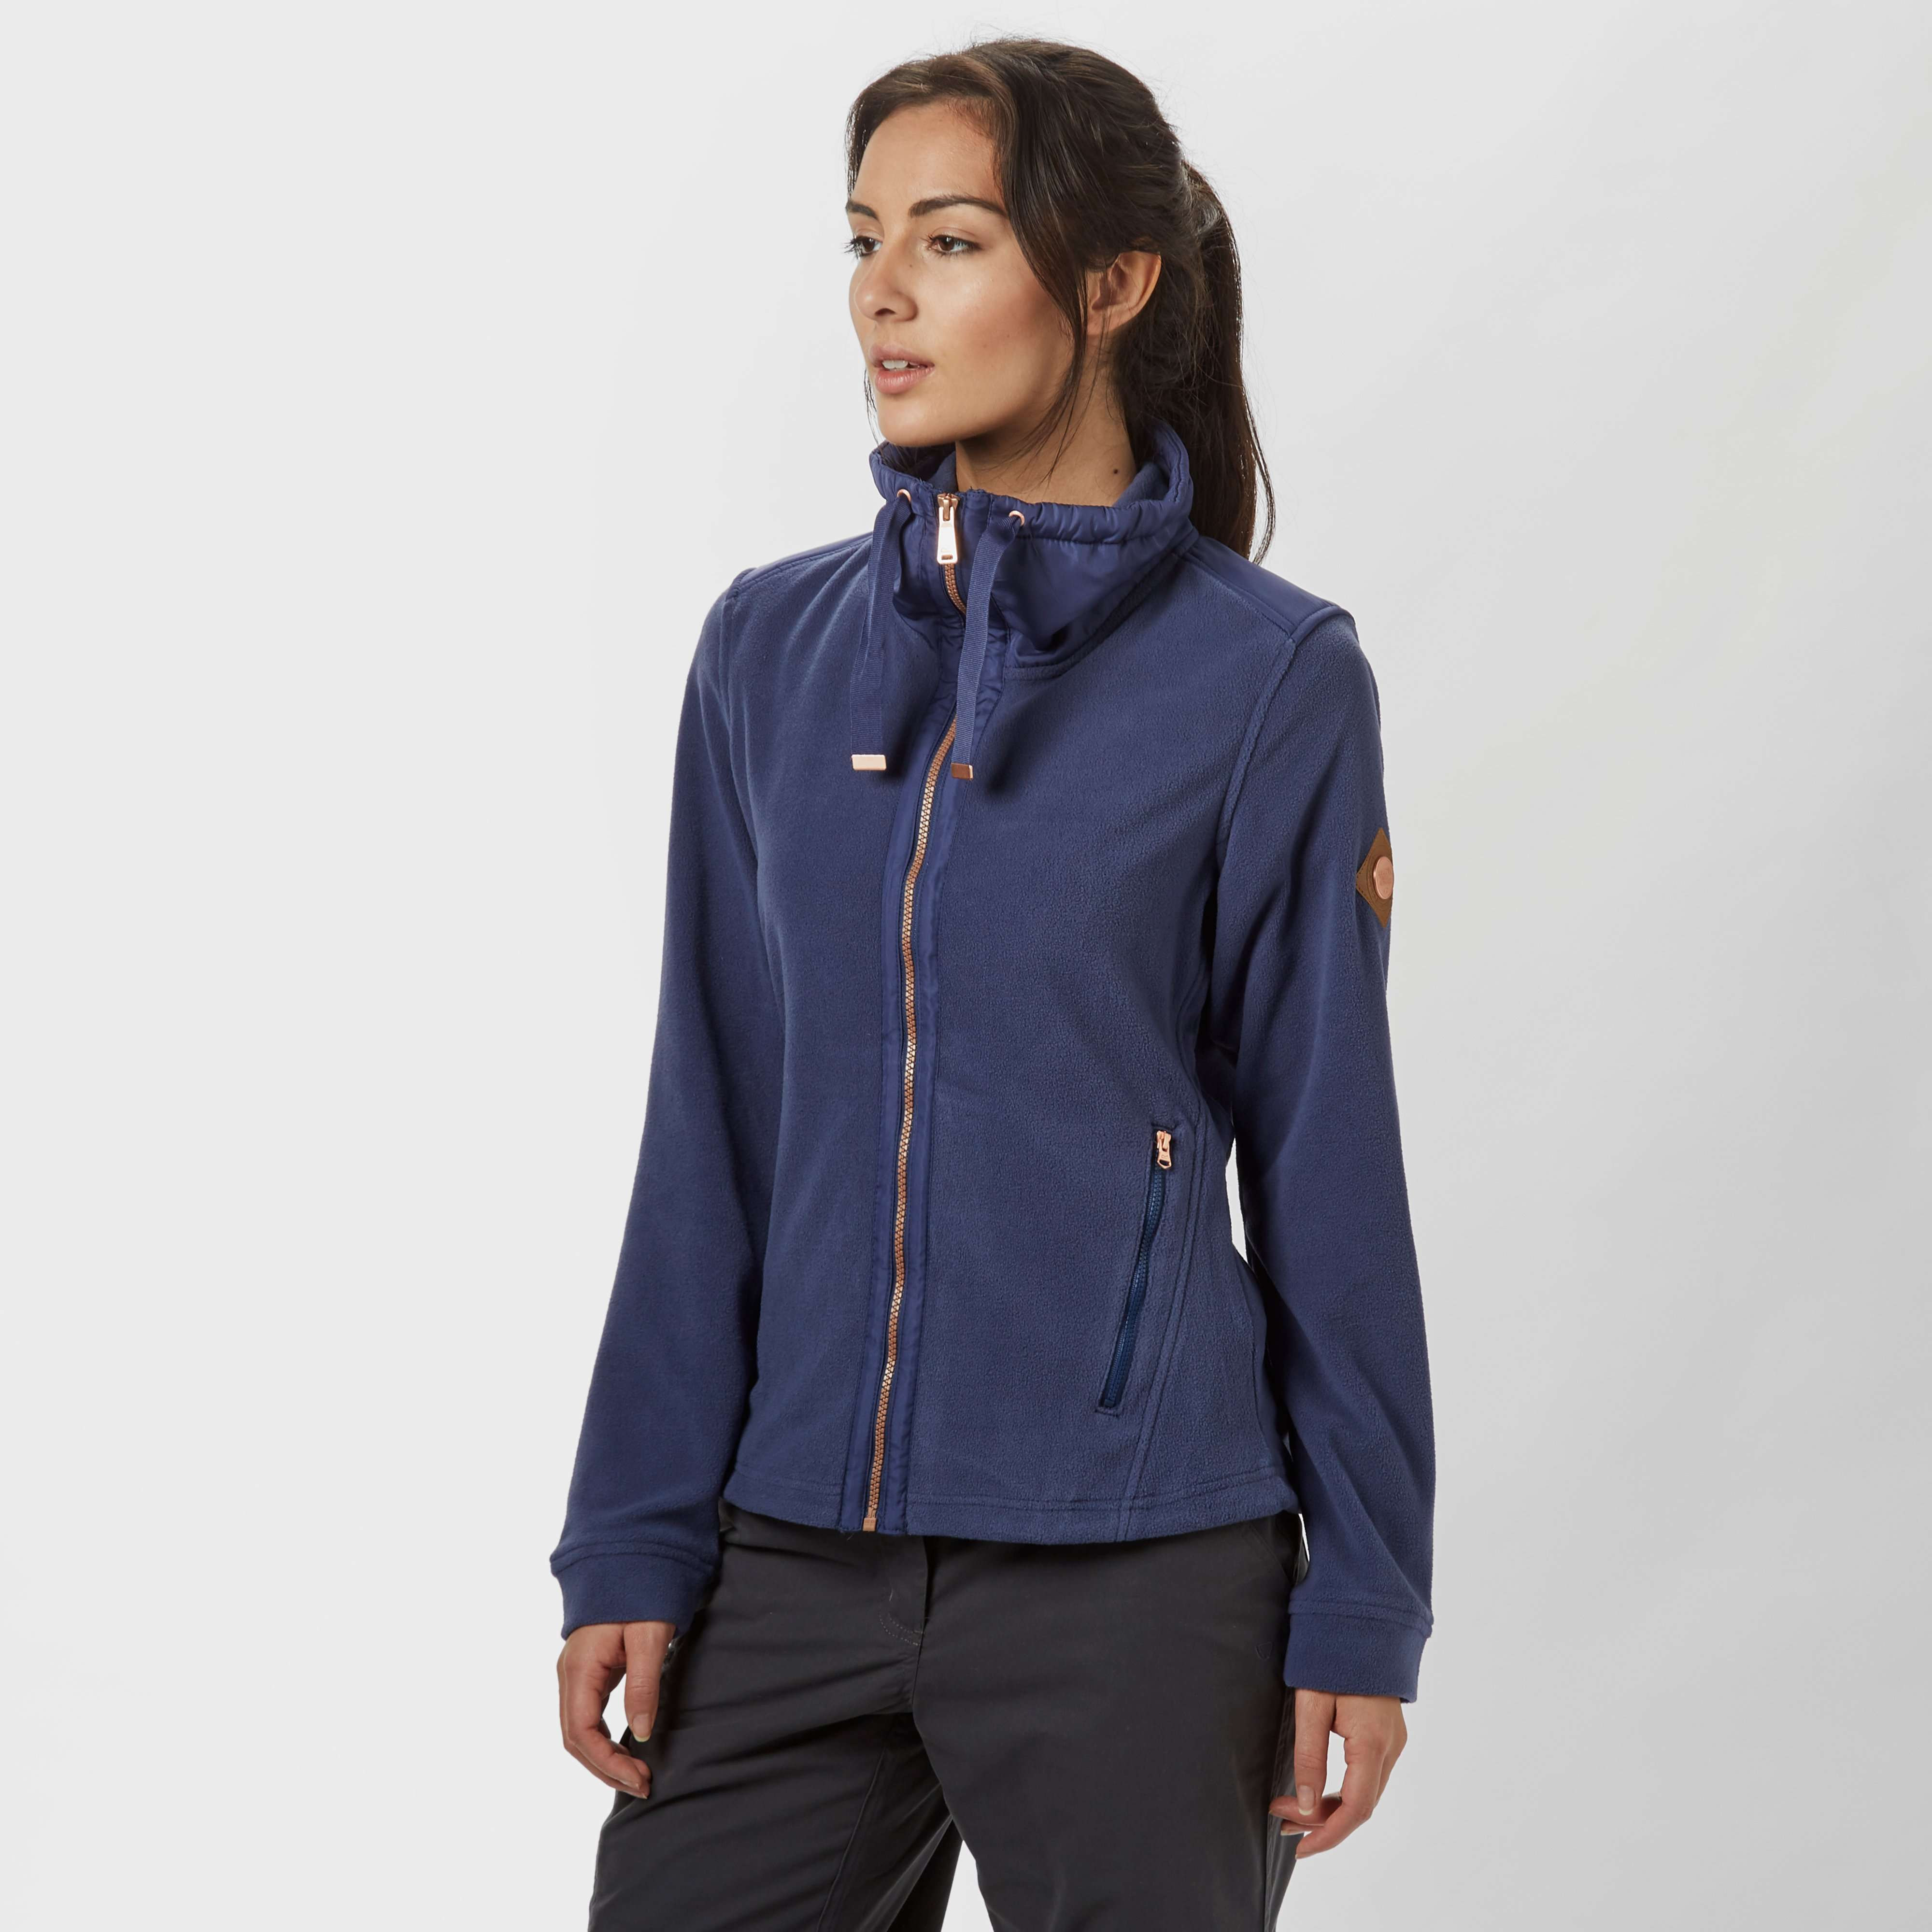 REGATTA Women's Daphnie Full-Zip Fleece